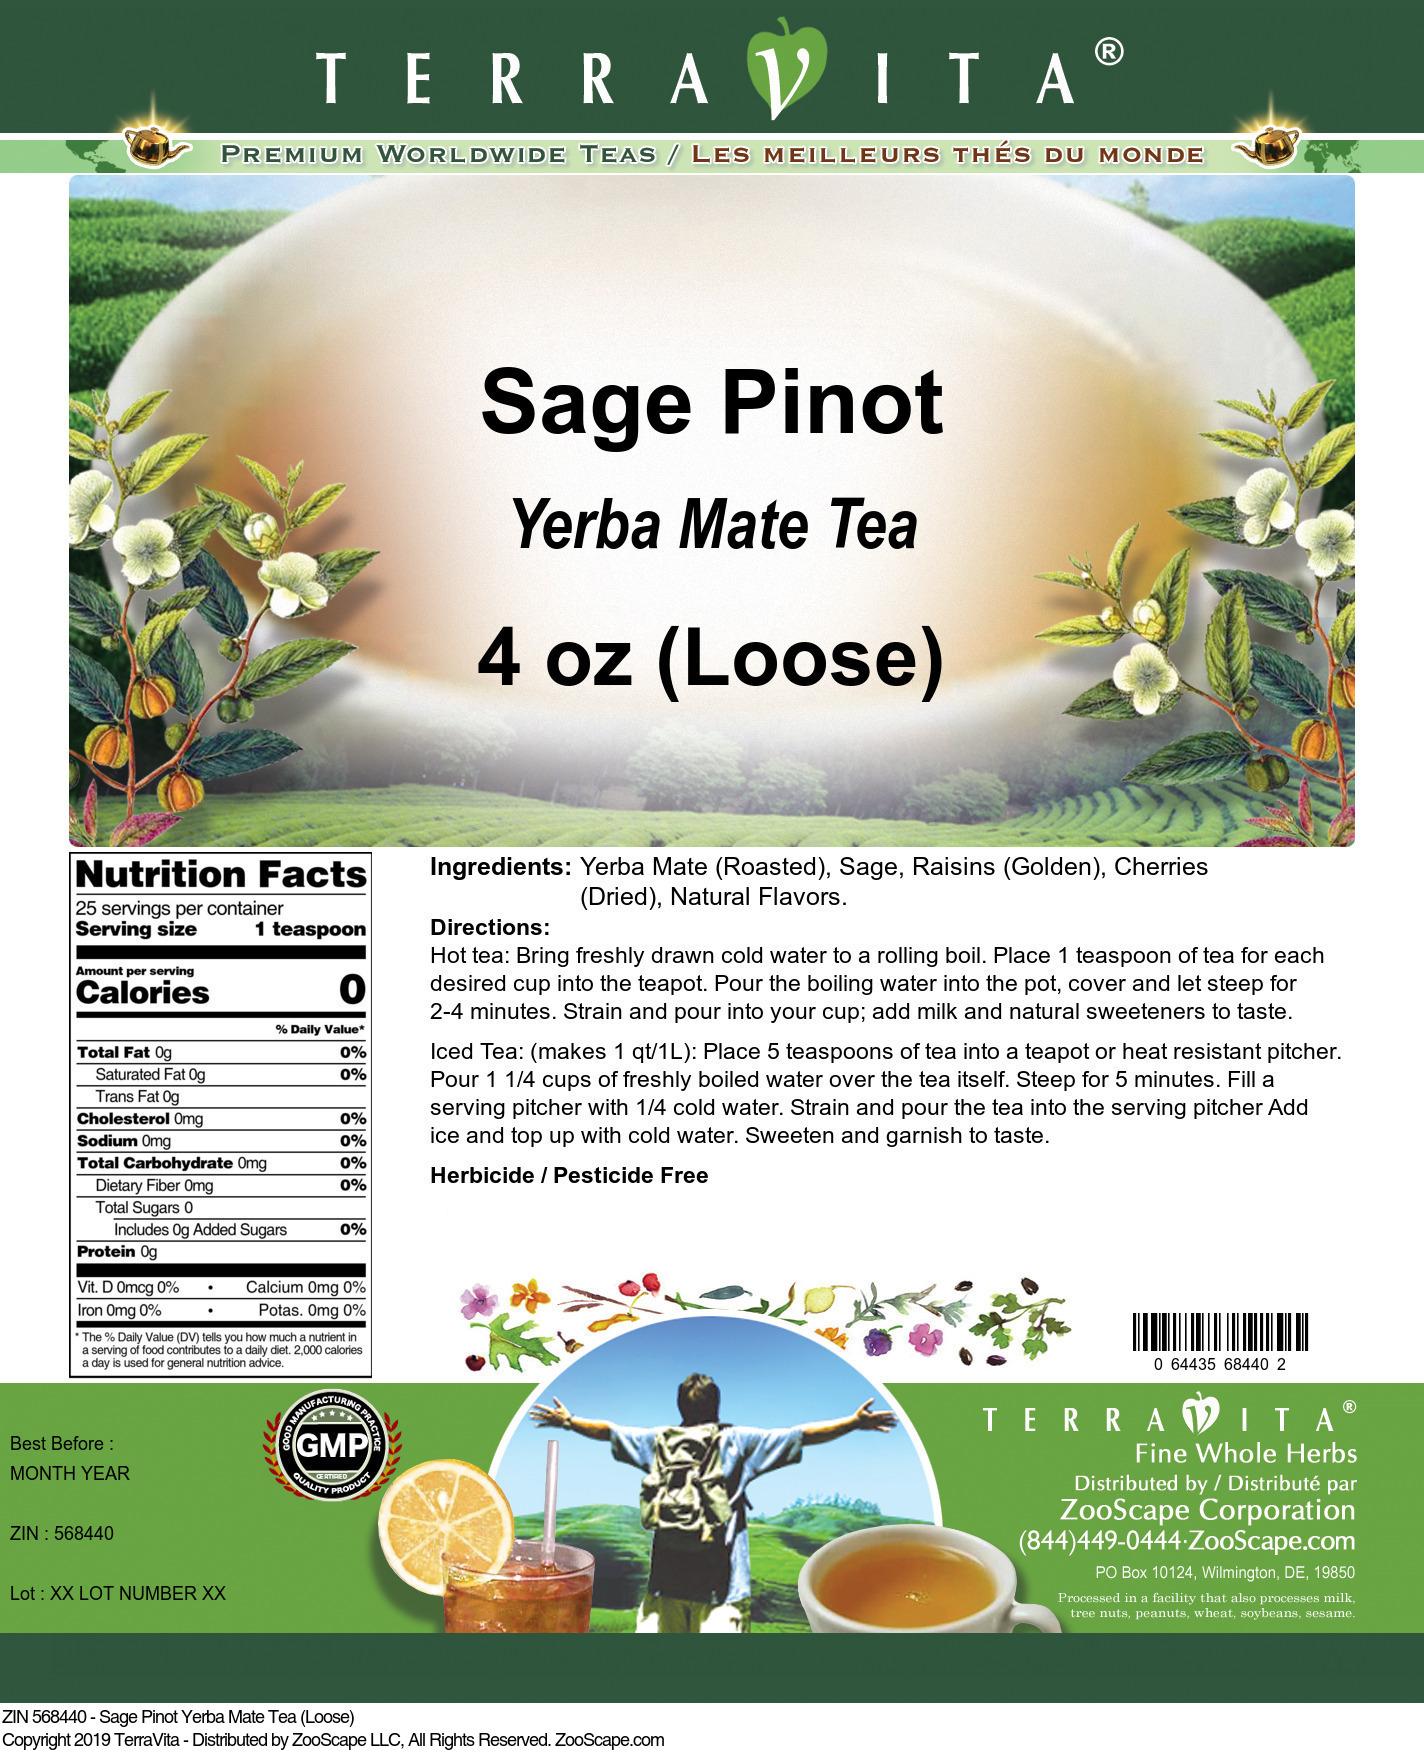 Sage Pinot Yerba Mate Tea (Loose)